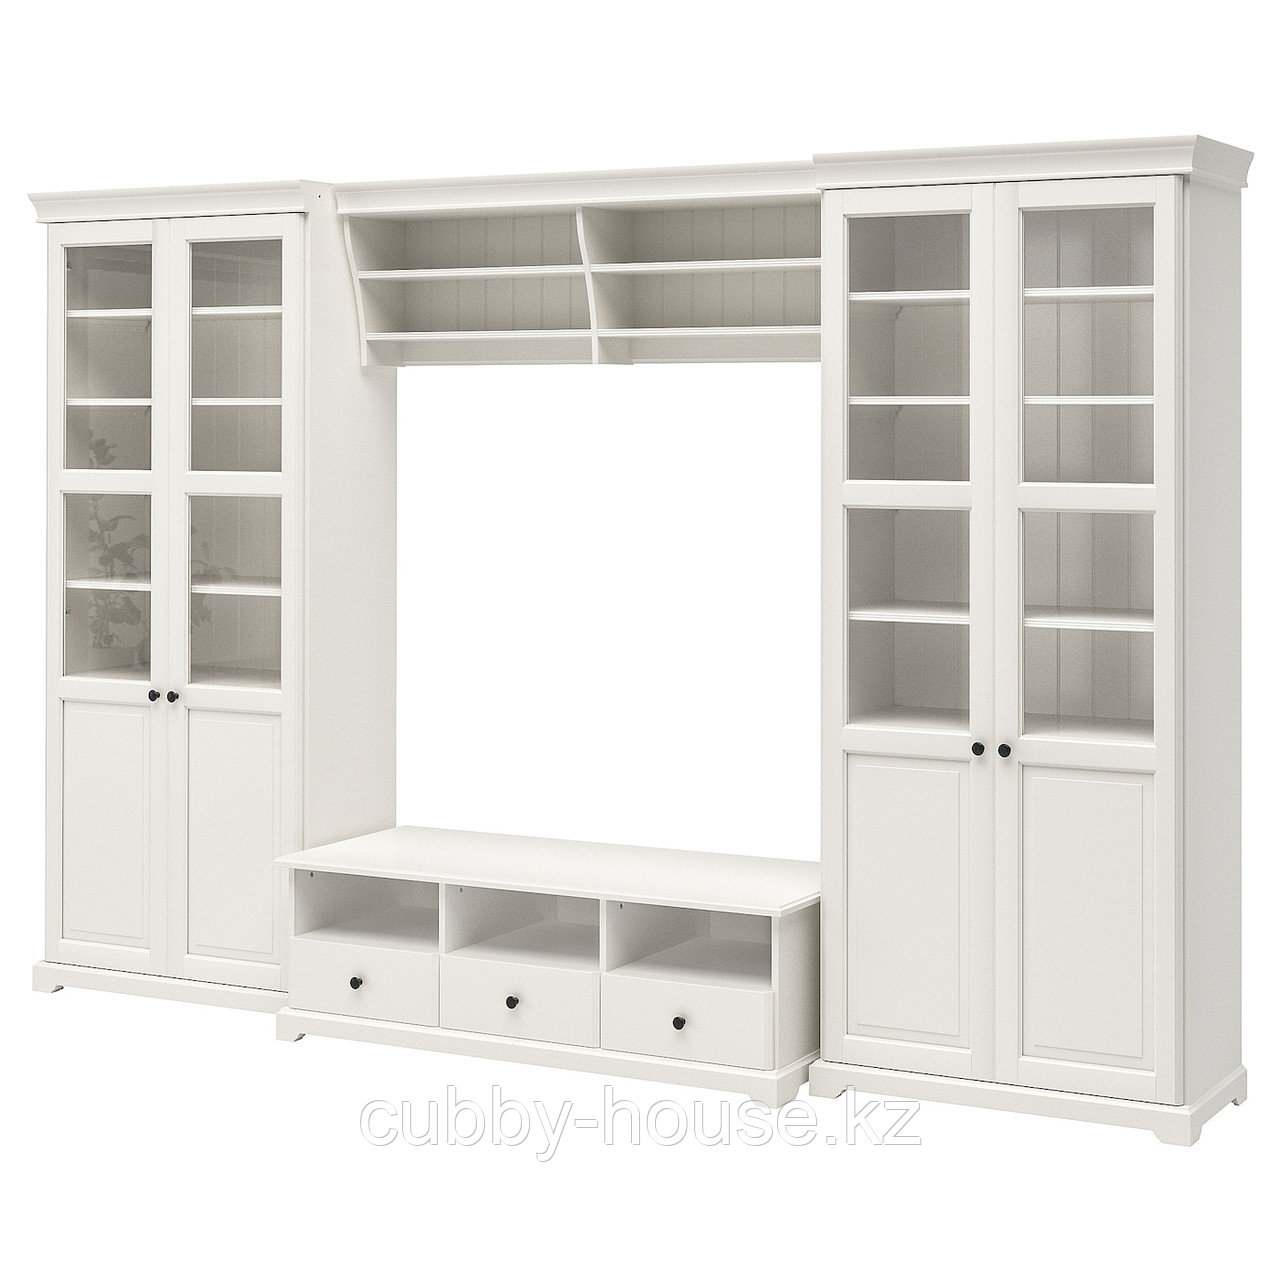 ЛИАТОРП Шкаф для ТВ, комбинация, белый, 332x214 см